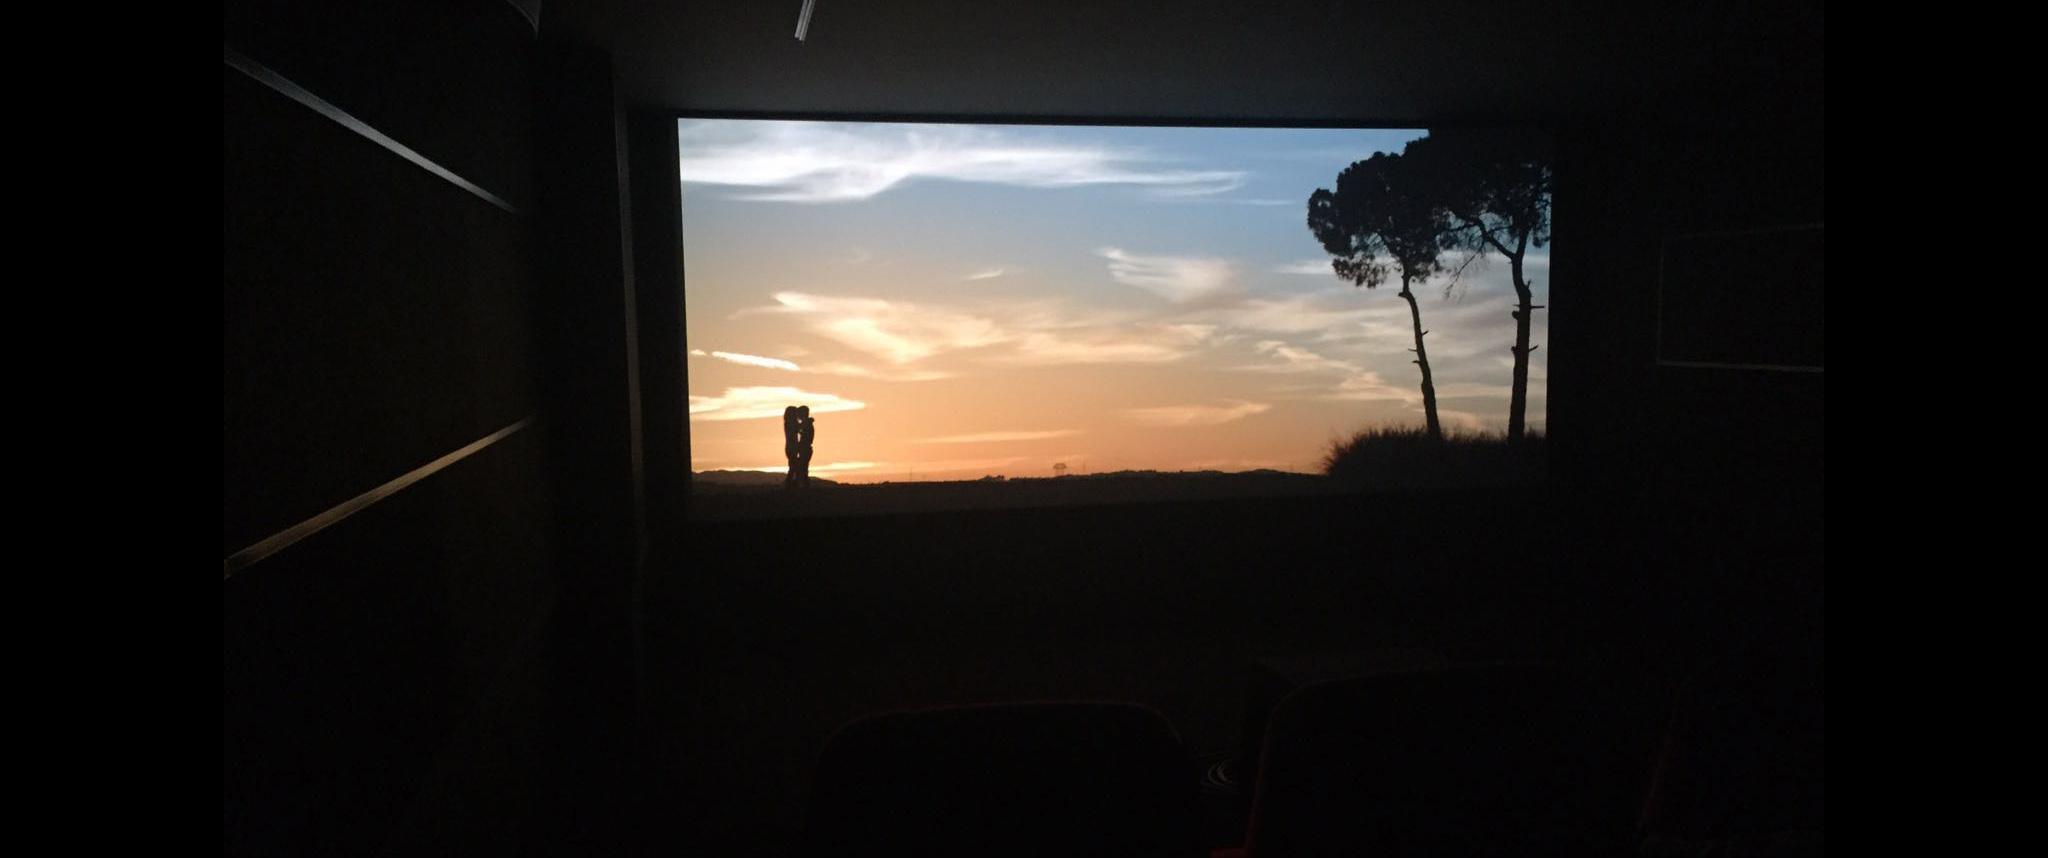 AntavianaFilms_MediaNoche_film